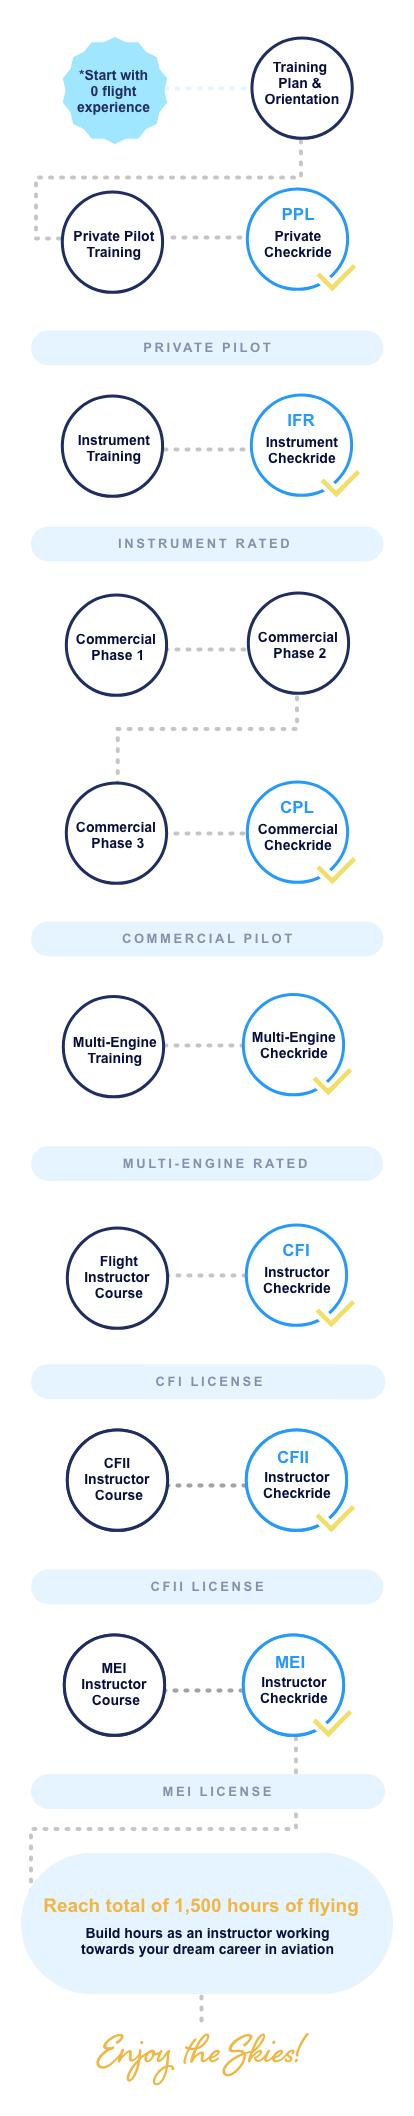 Career Pilot Program